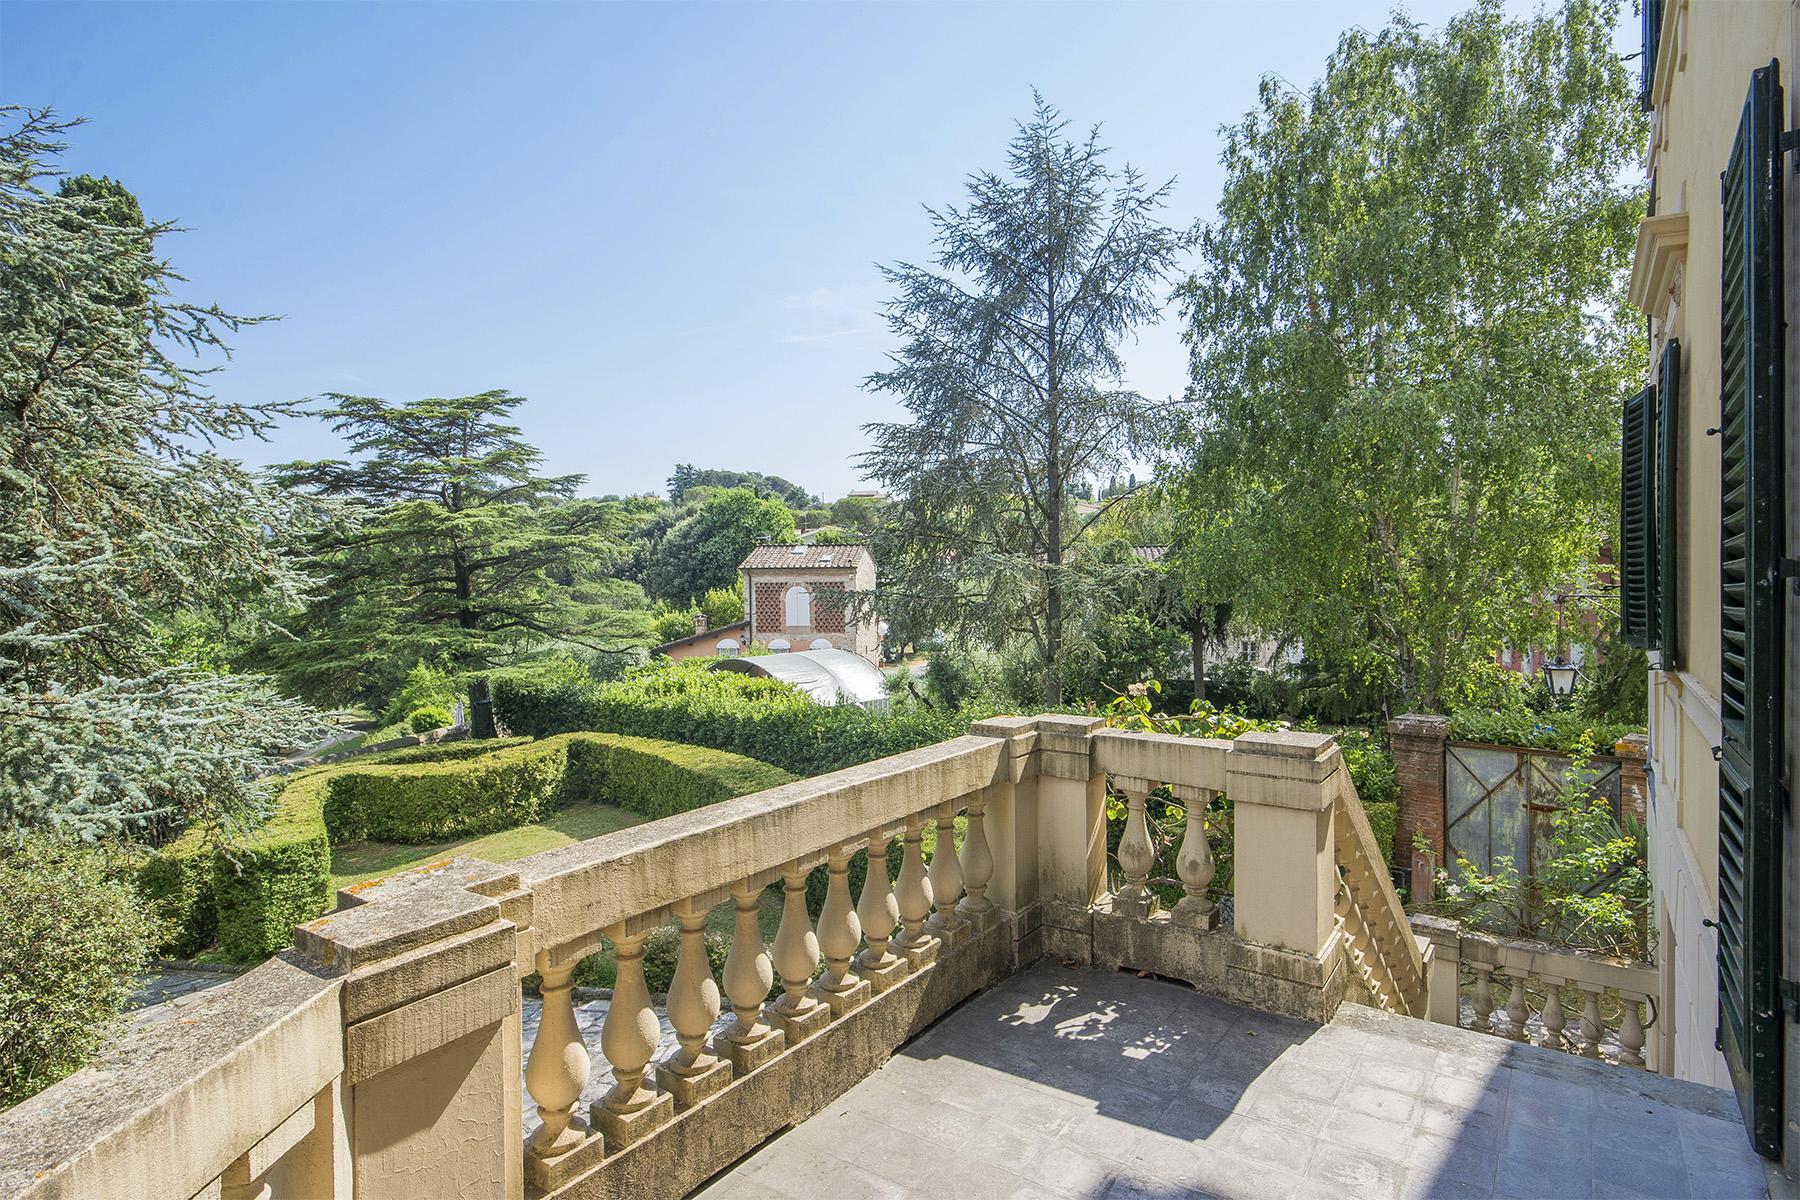 Villa in Vendita a Lucca: 5 locali, 1150 mq - Foto 13